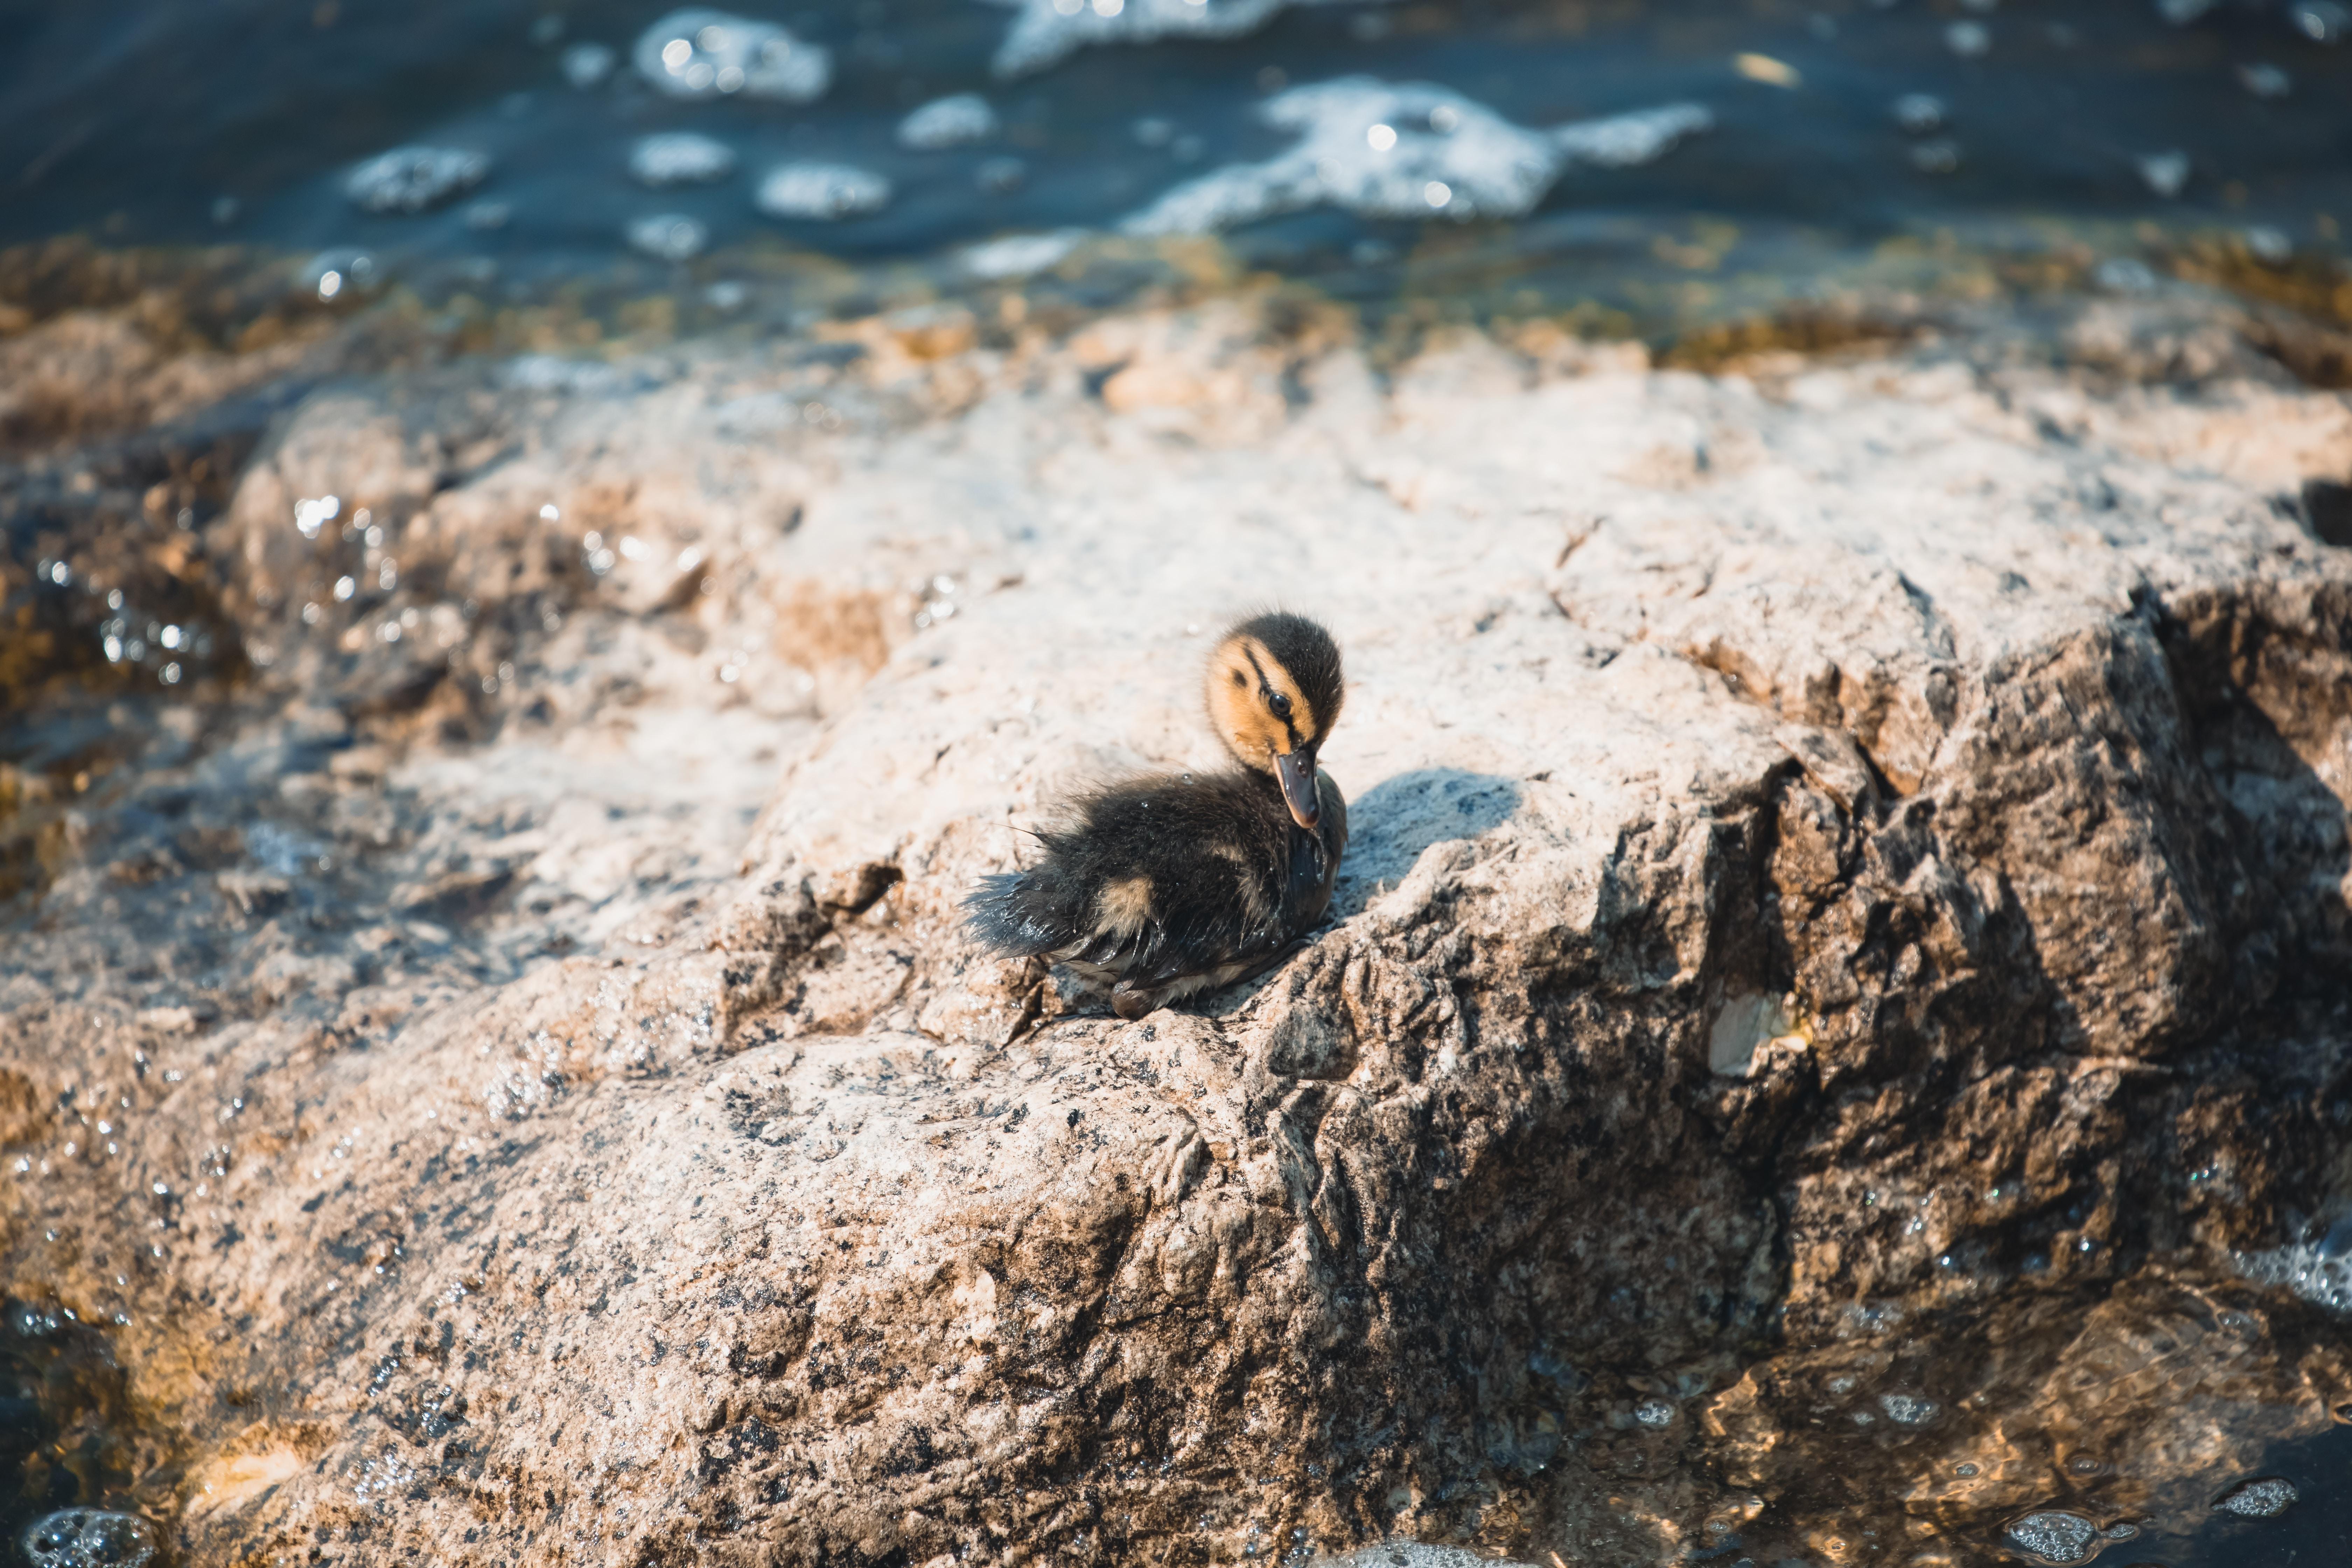 black duck on stone near body of water